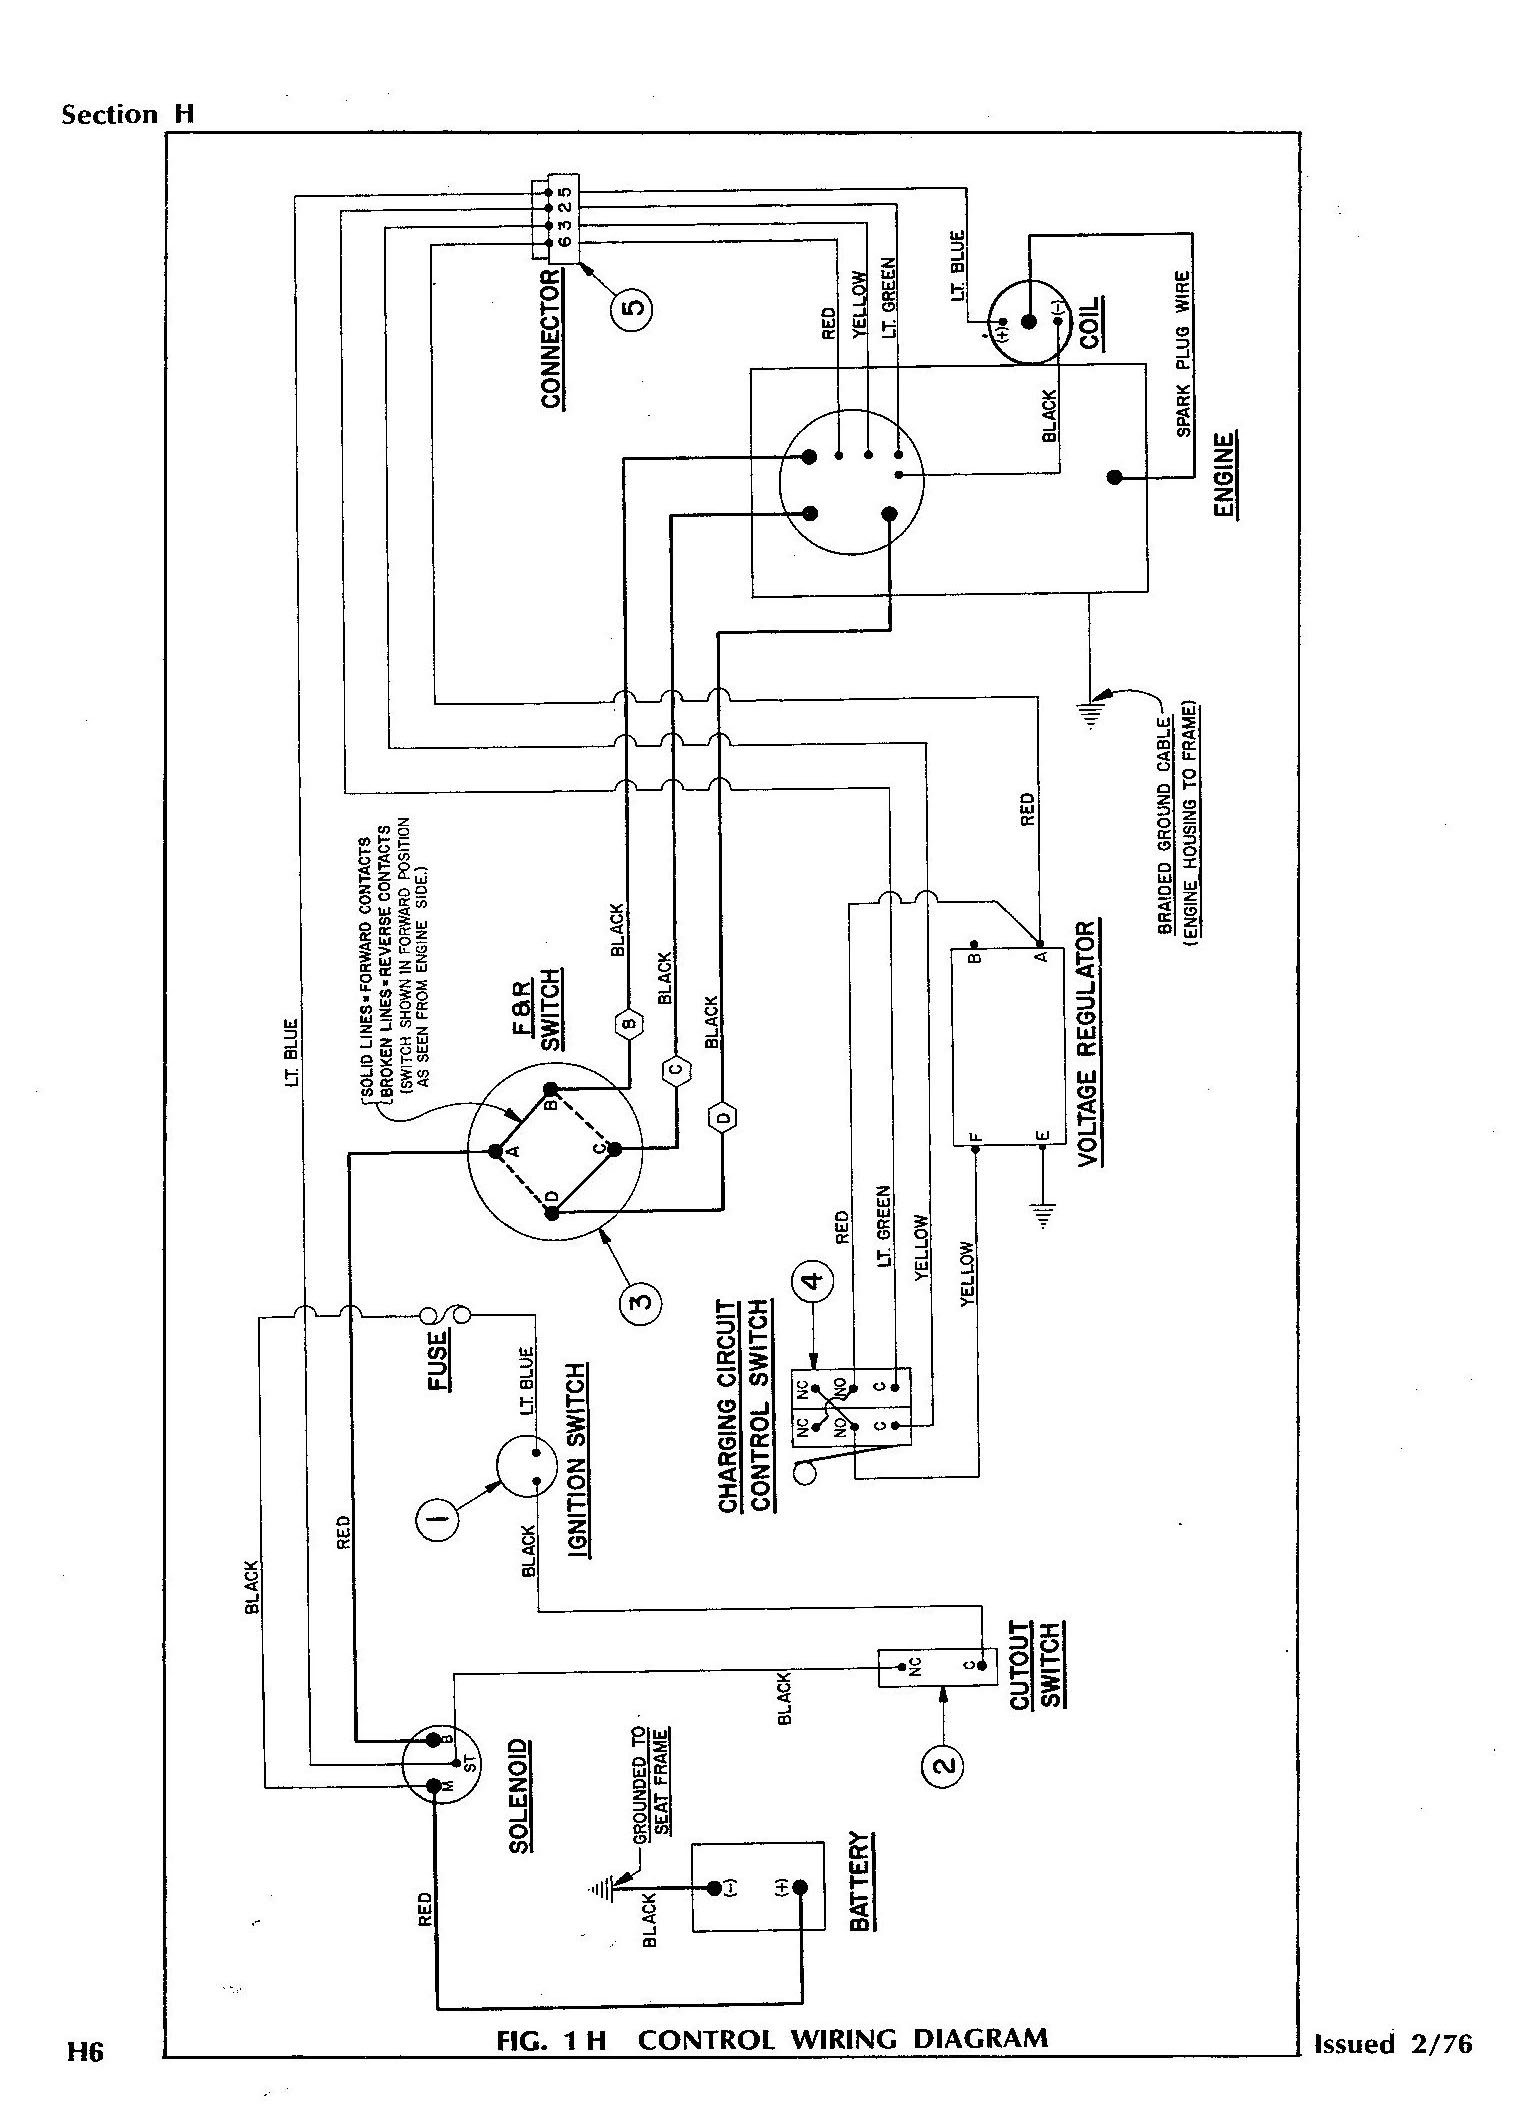 Superb Wiring Diagram Further Ezgo Electric Golf Cart Wiring Diagram Wiring Cloud Onicaxeromohammedshrineorg